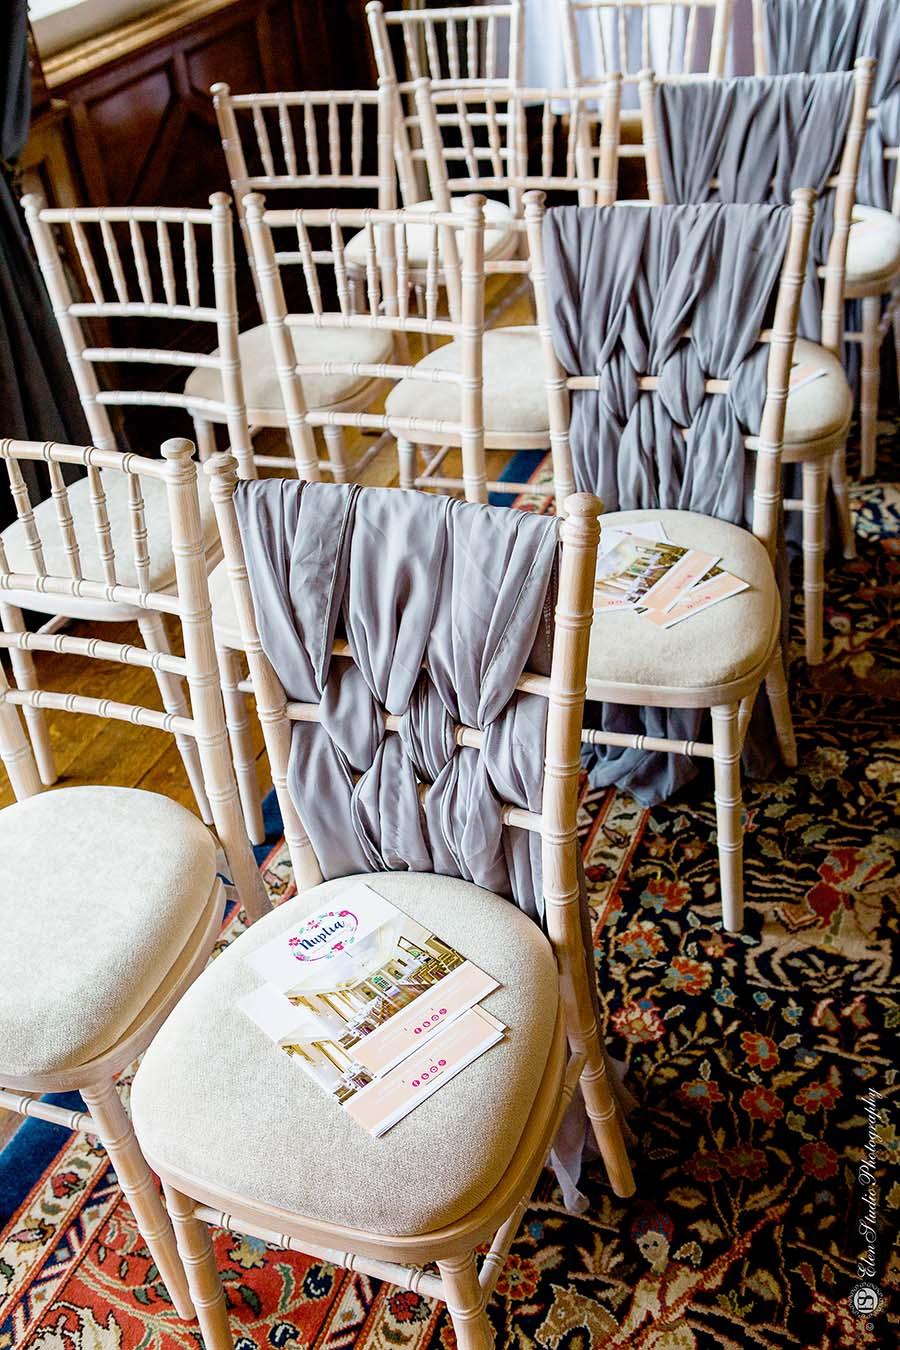 Hodsock-priory-wedding-fair-Elen-Studio-Photography-011